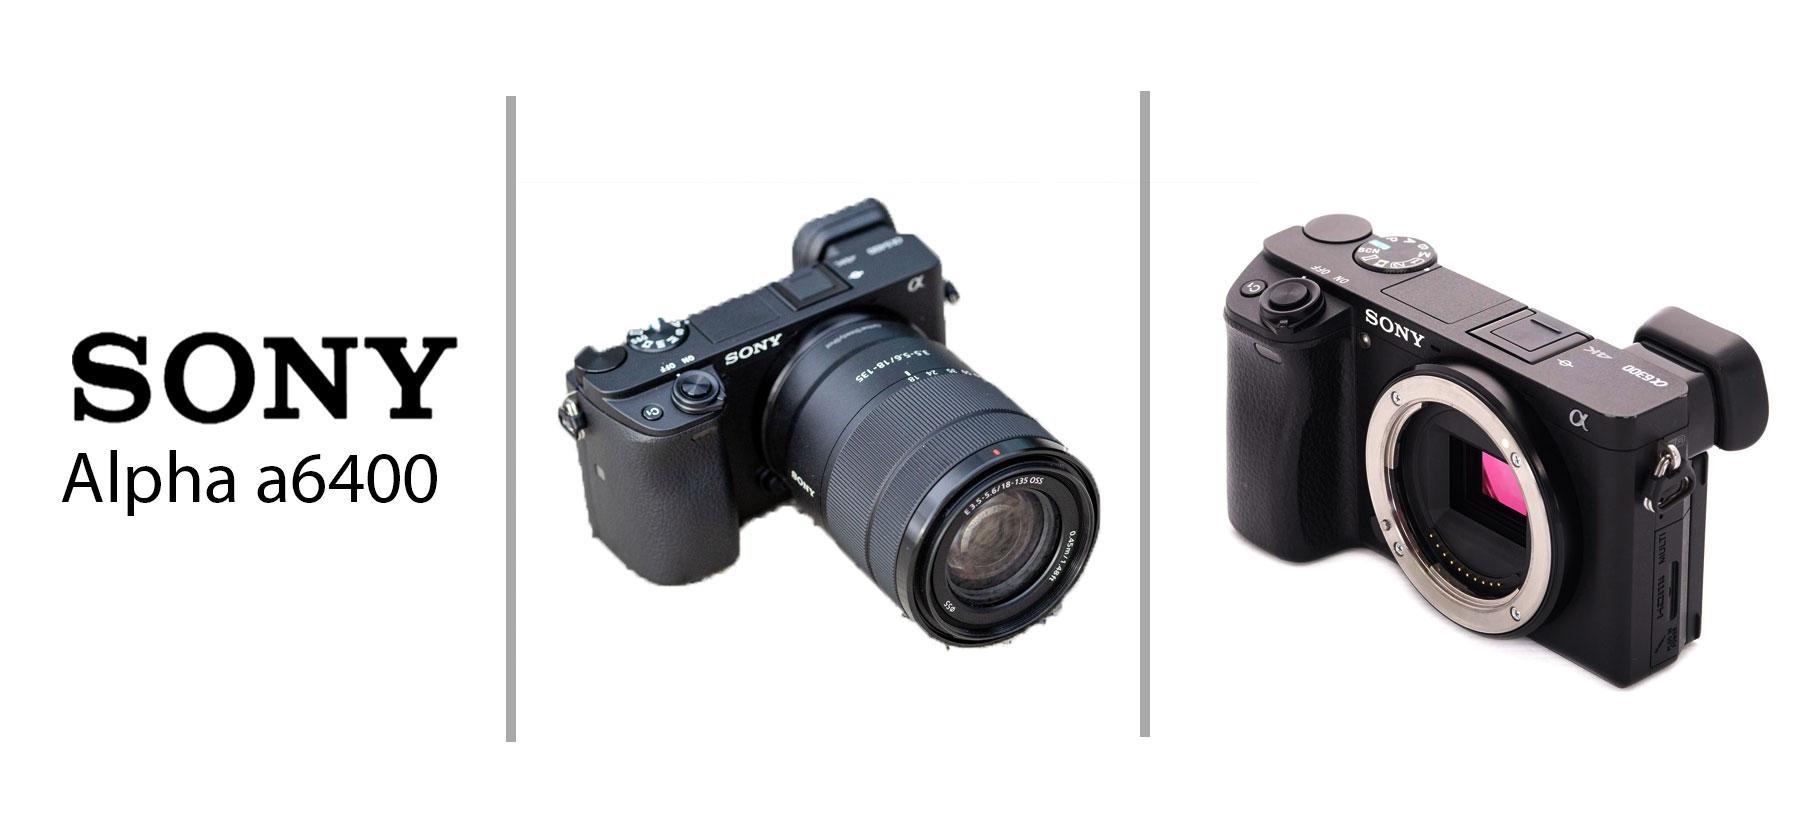 sony-alpha-a6400 best sony camera price in nepal